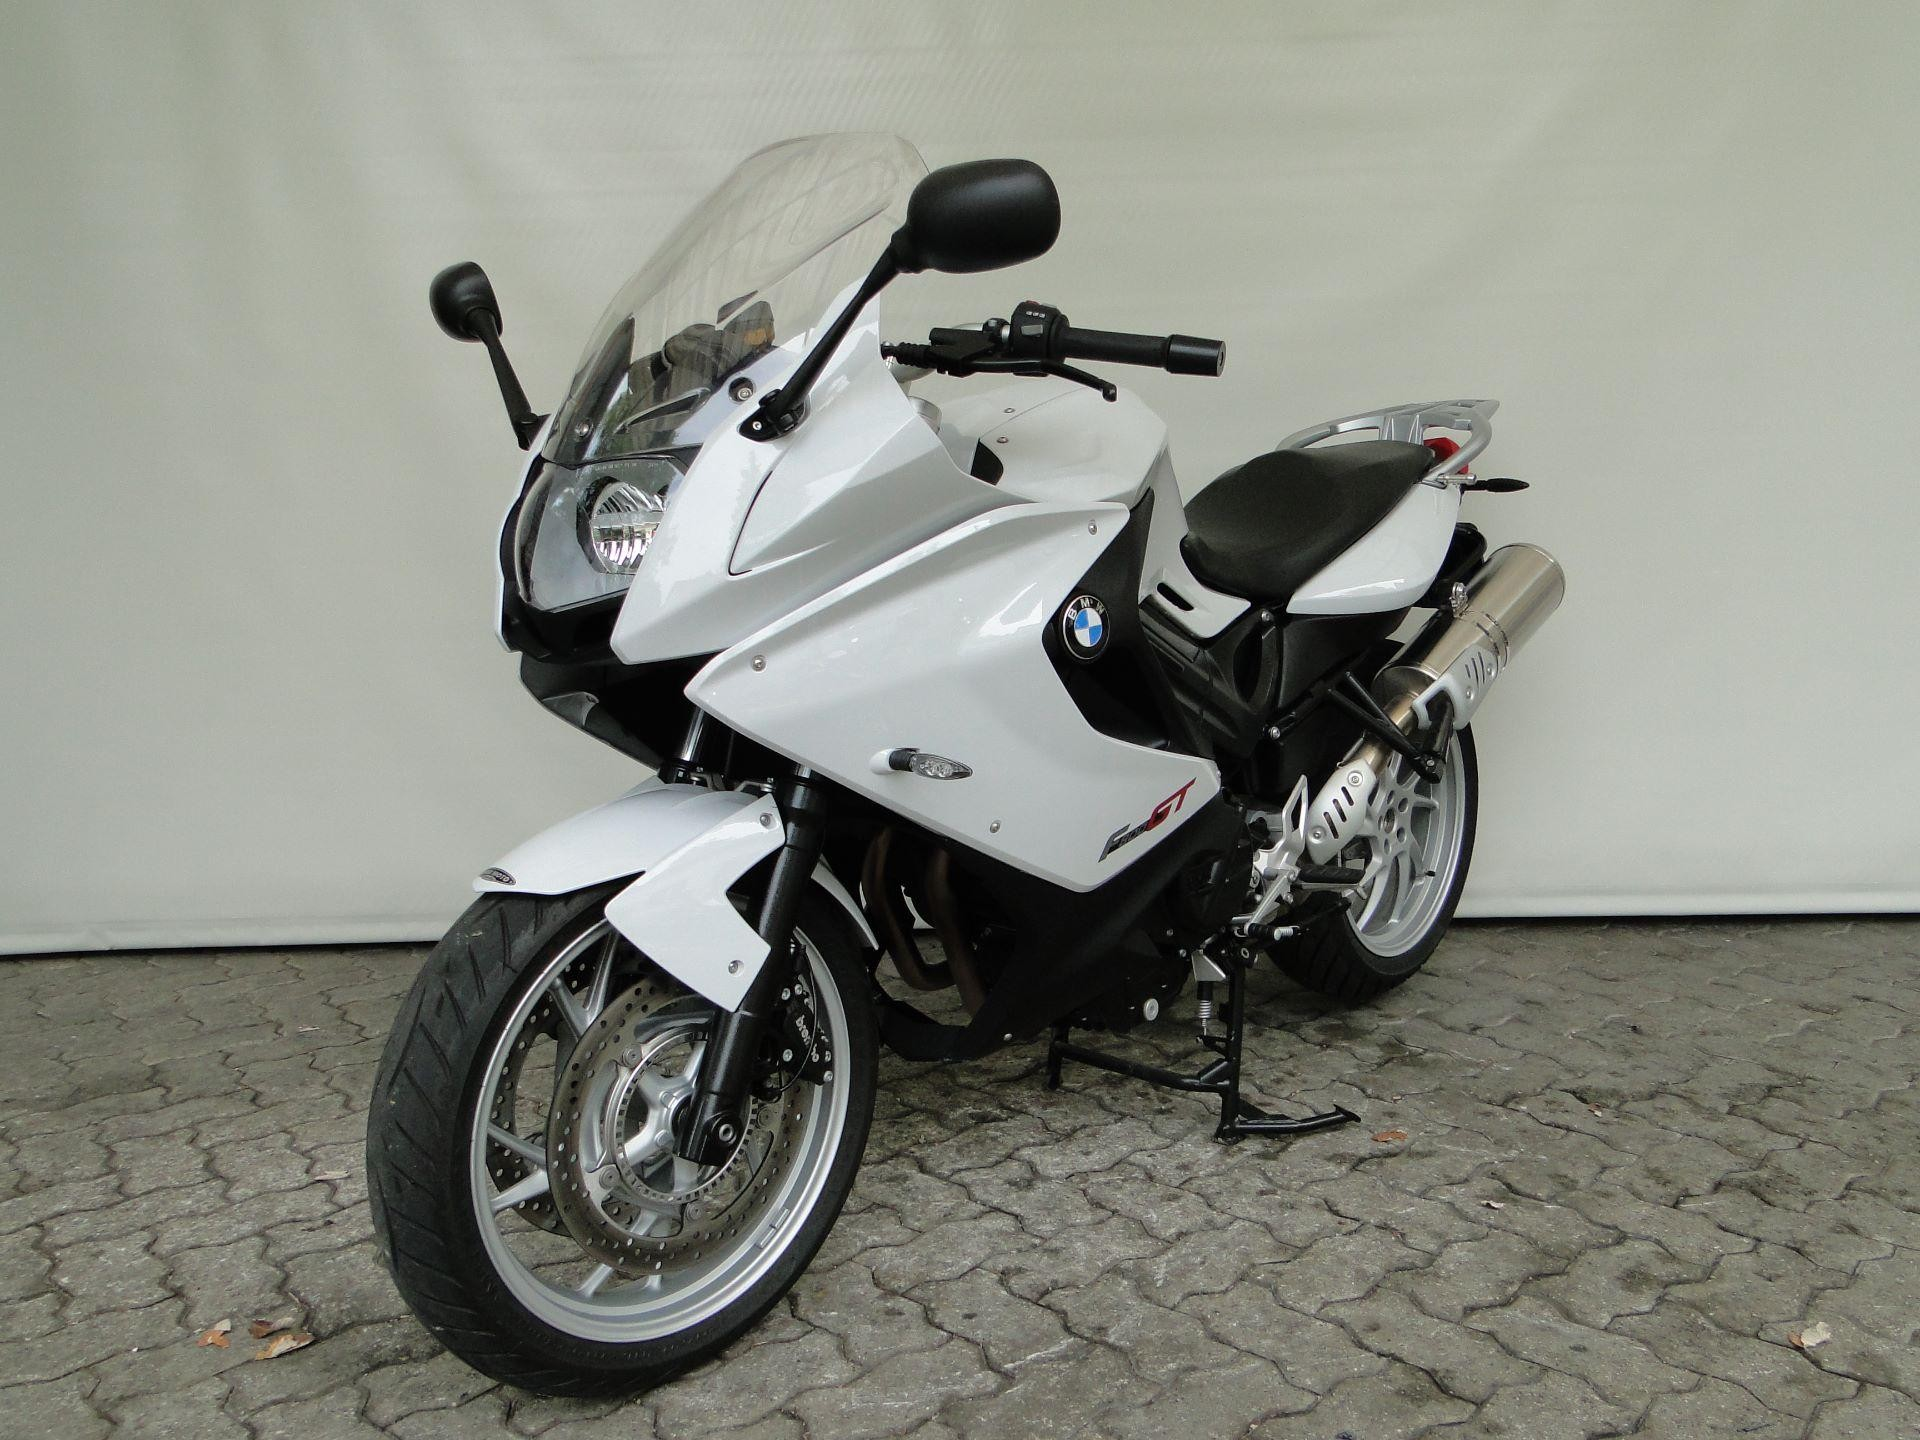 motorrad occasion kaufen bmw f 800 gt abs hobi moto ag winterthur. Black Bedroom Furniture Sets. Home Design Ideas